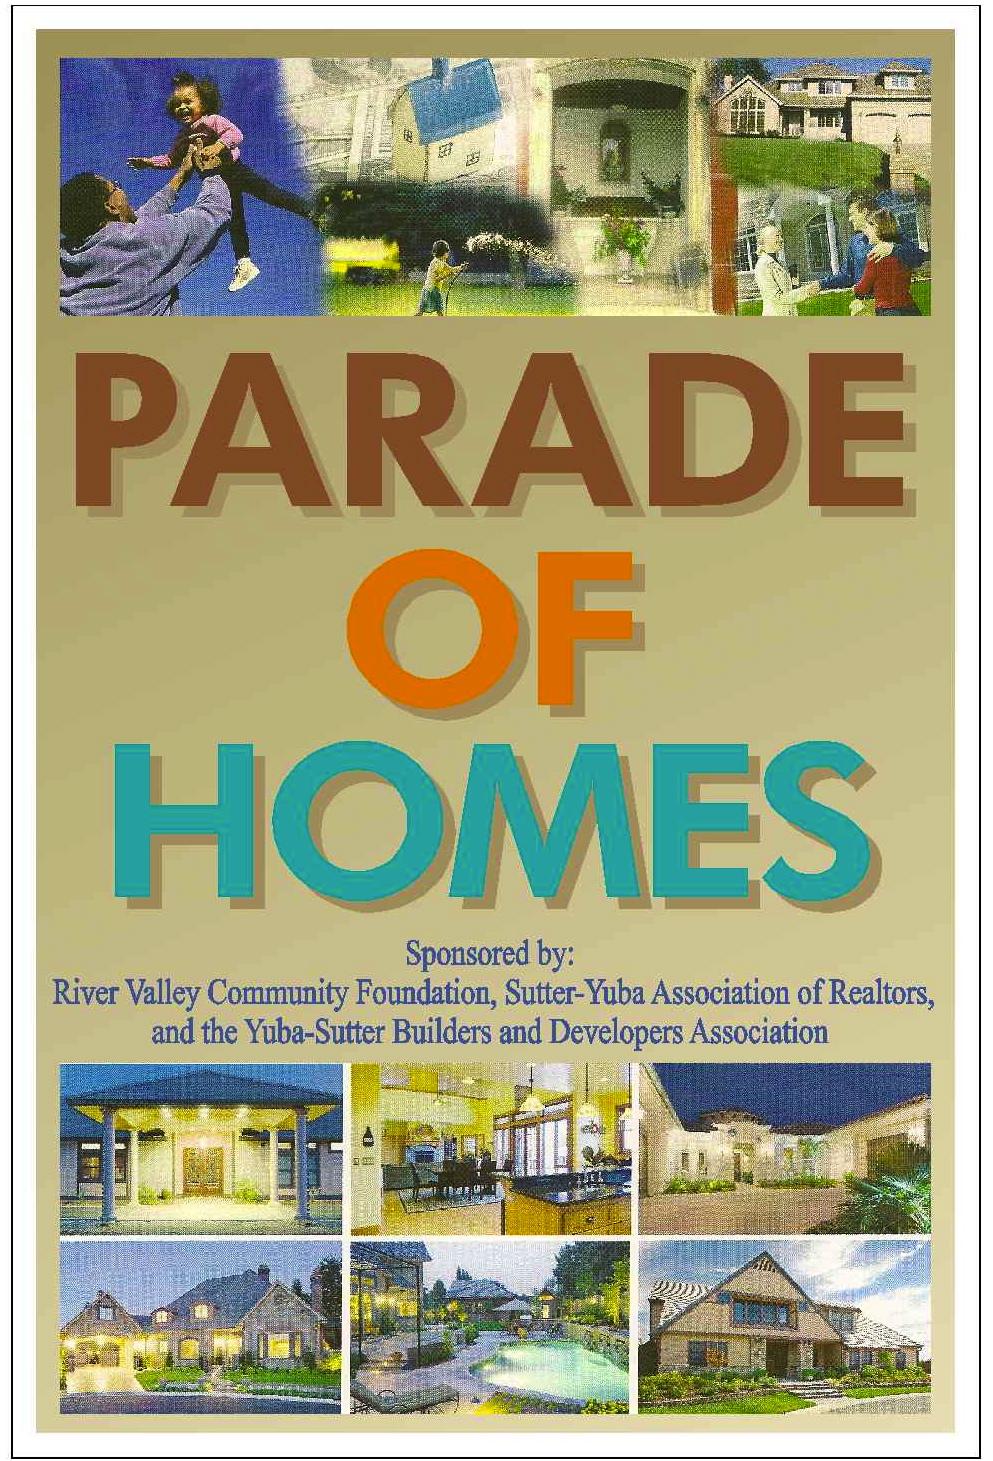 parade of homes mdo_2.jpg